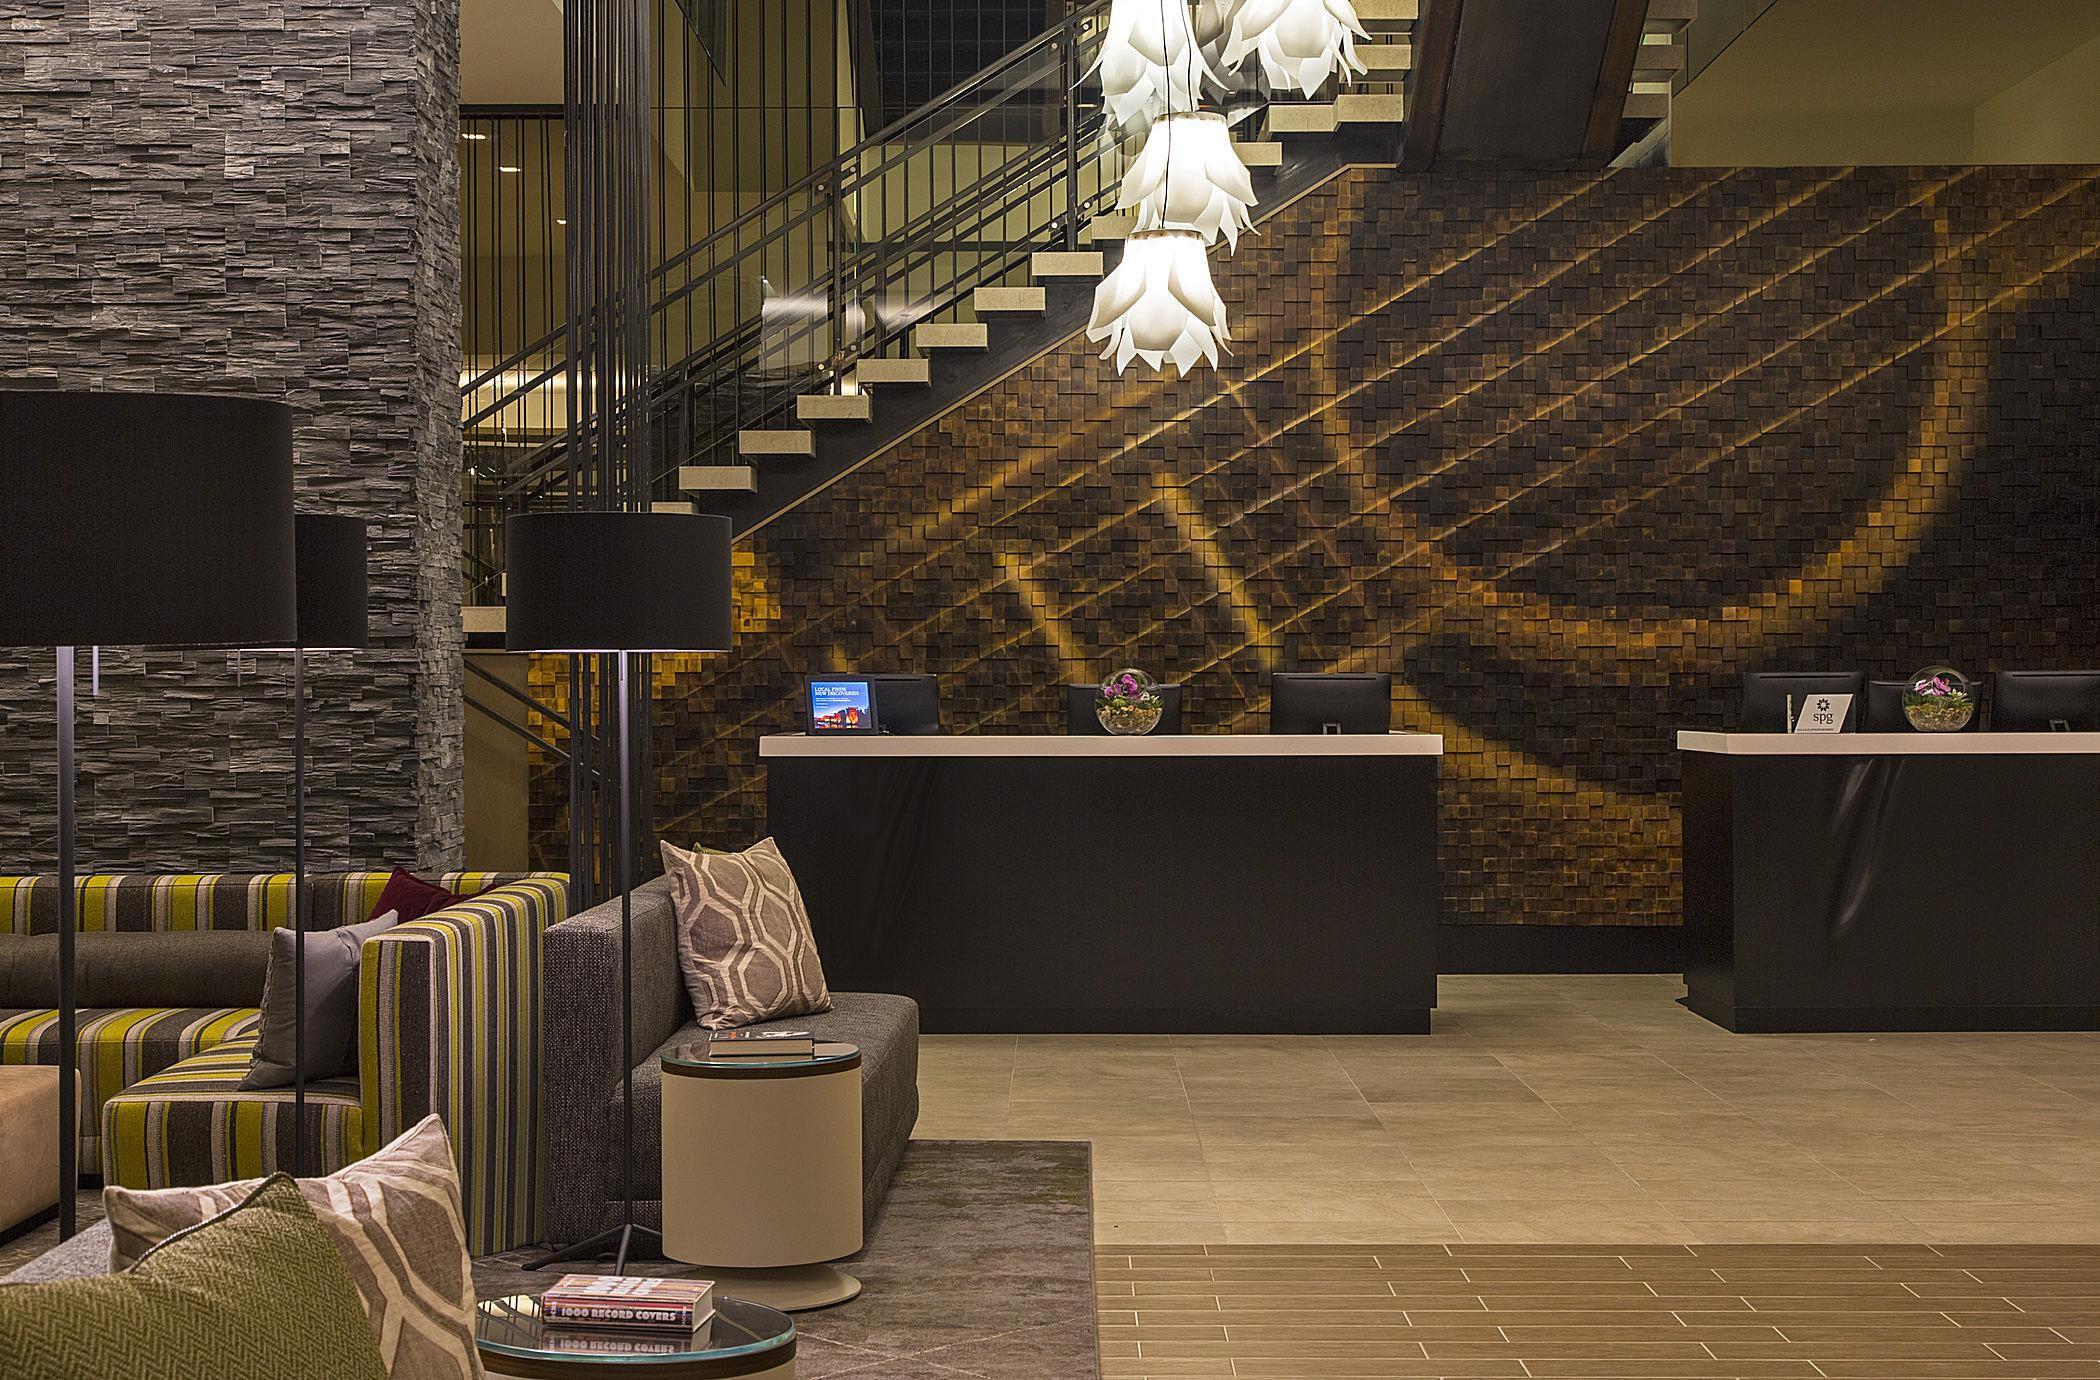 Westin Austin Downtown - Hotel Review